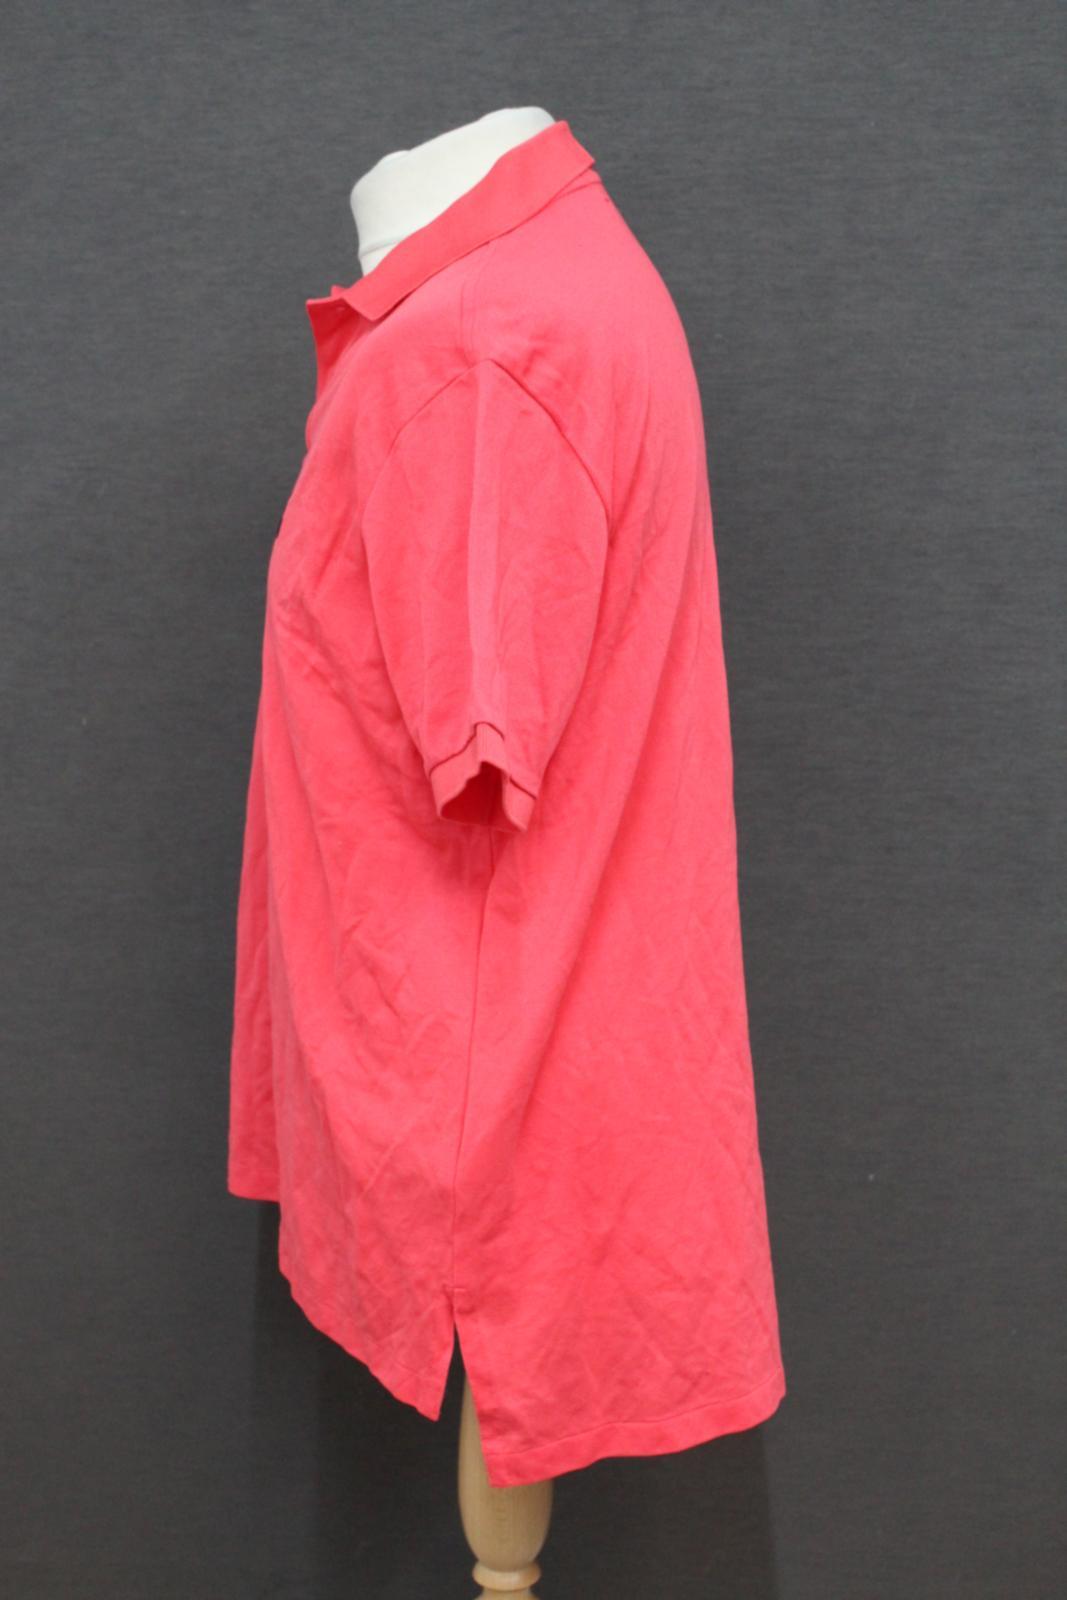 Ralph-Lauren-Polo-para-hombre-de-color-rosa-de-algodon-Manga-Corta-Camisa-Polo-De-Ajuste miniatura 3